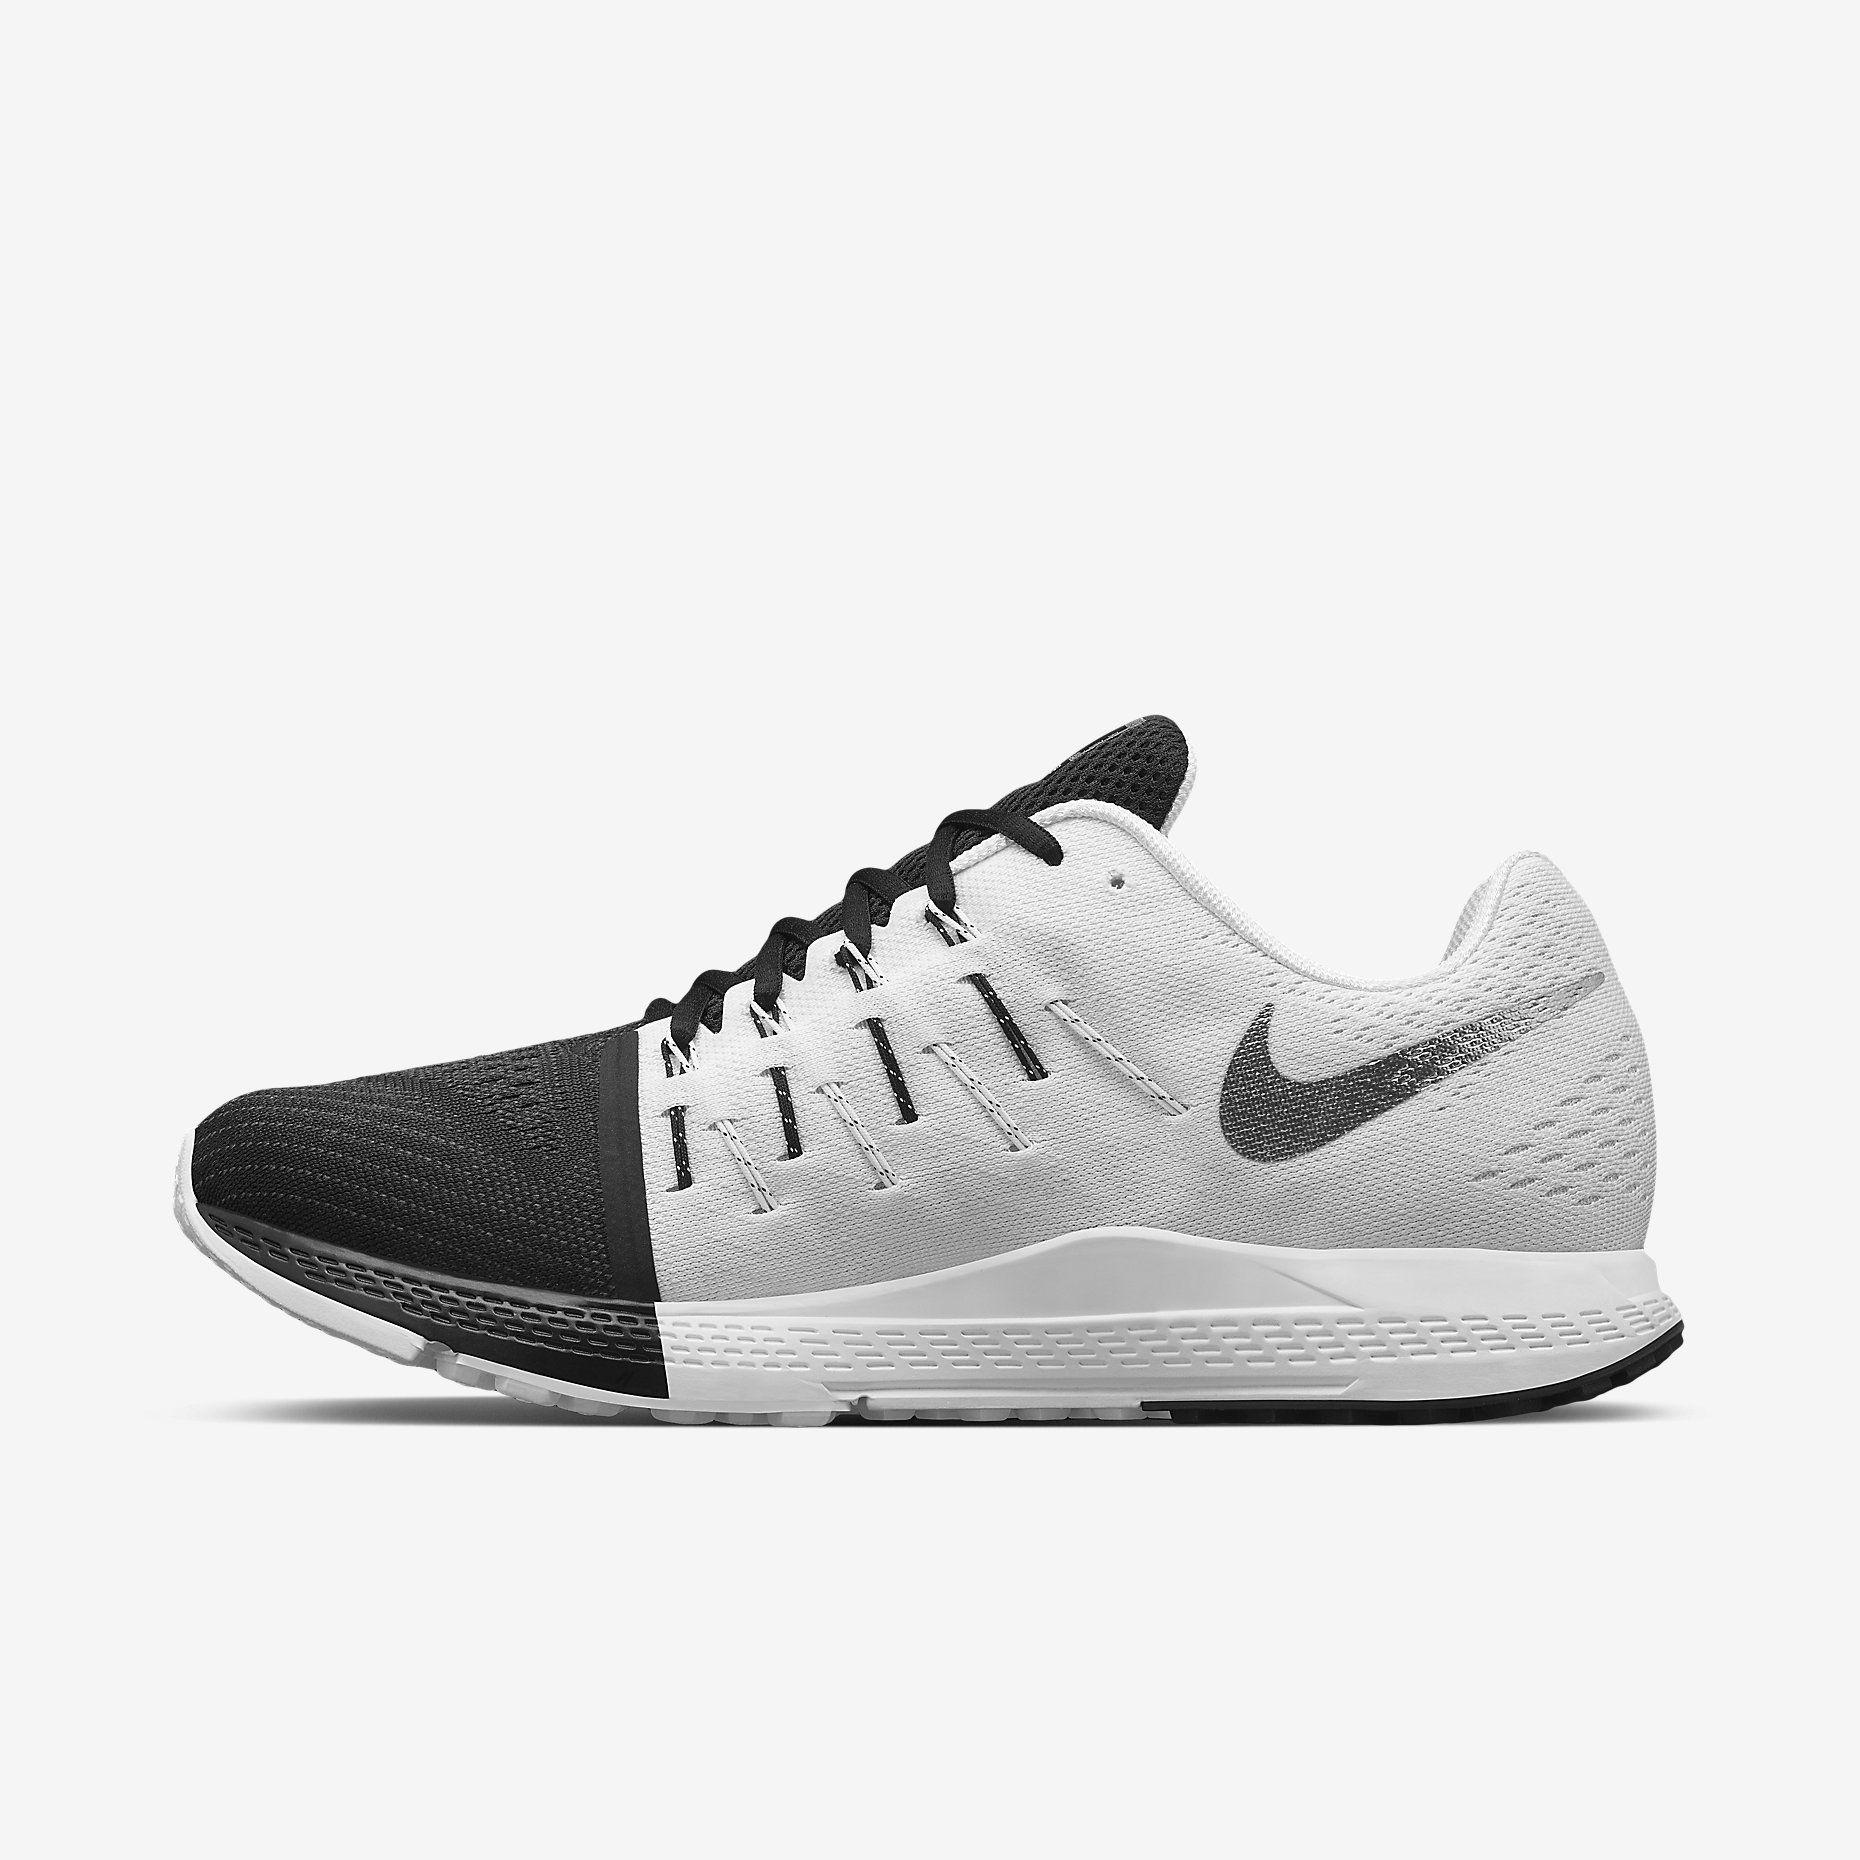 80ea7845f1181b NikeLab Air Zoom Elite 8 Premium Men s Running Shoe. Nike Store UK ...